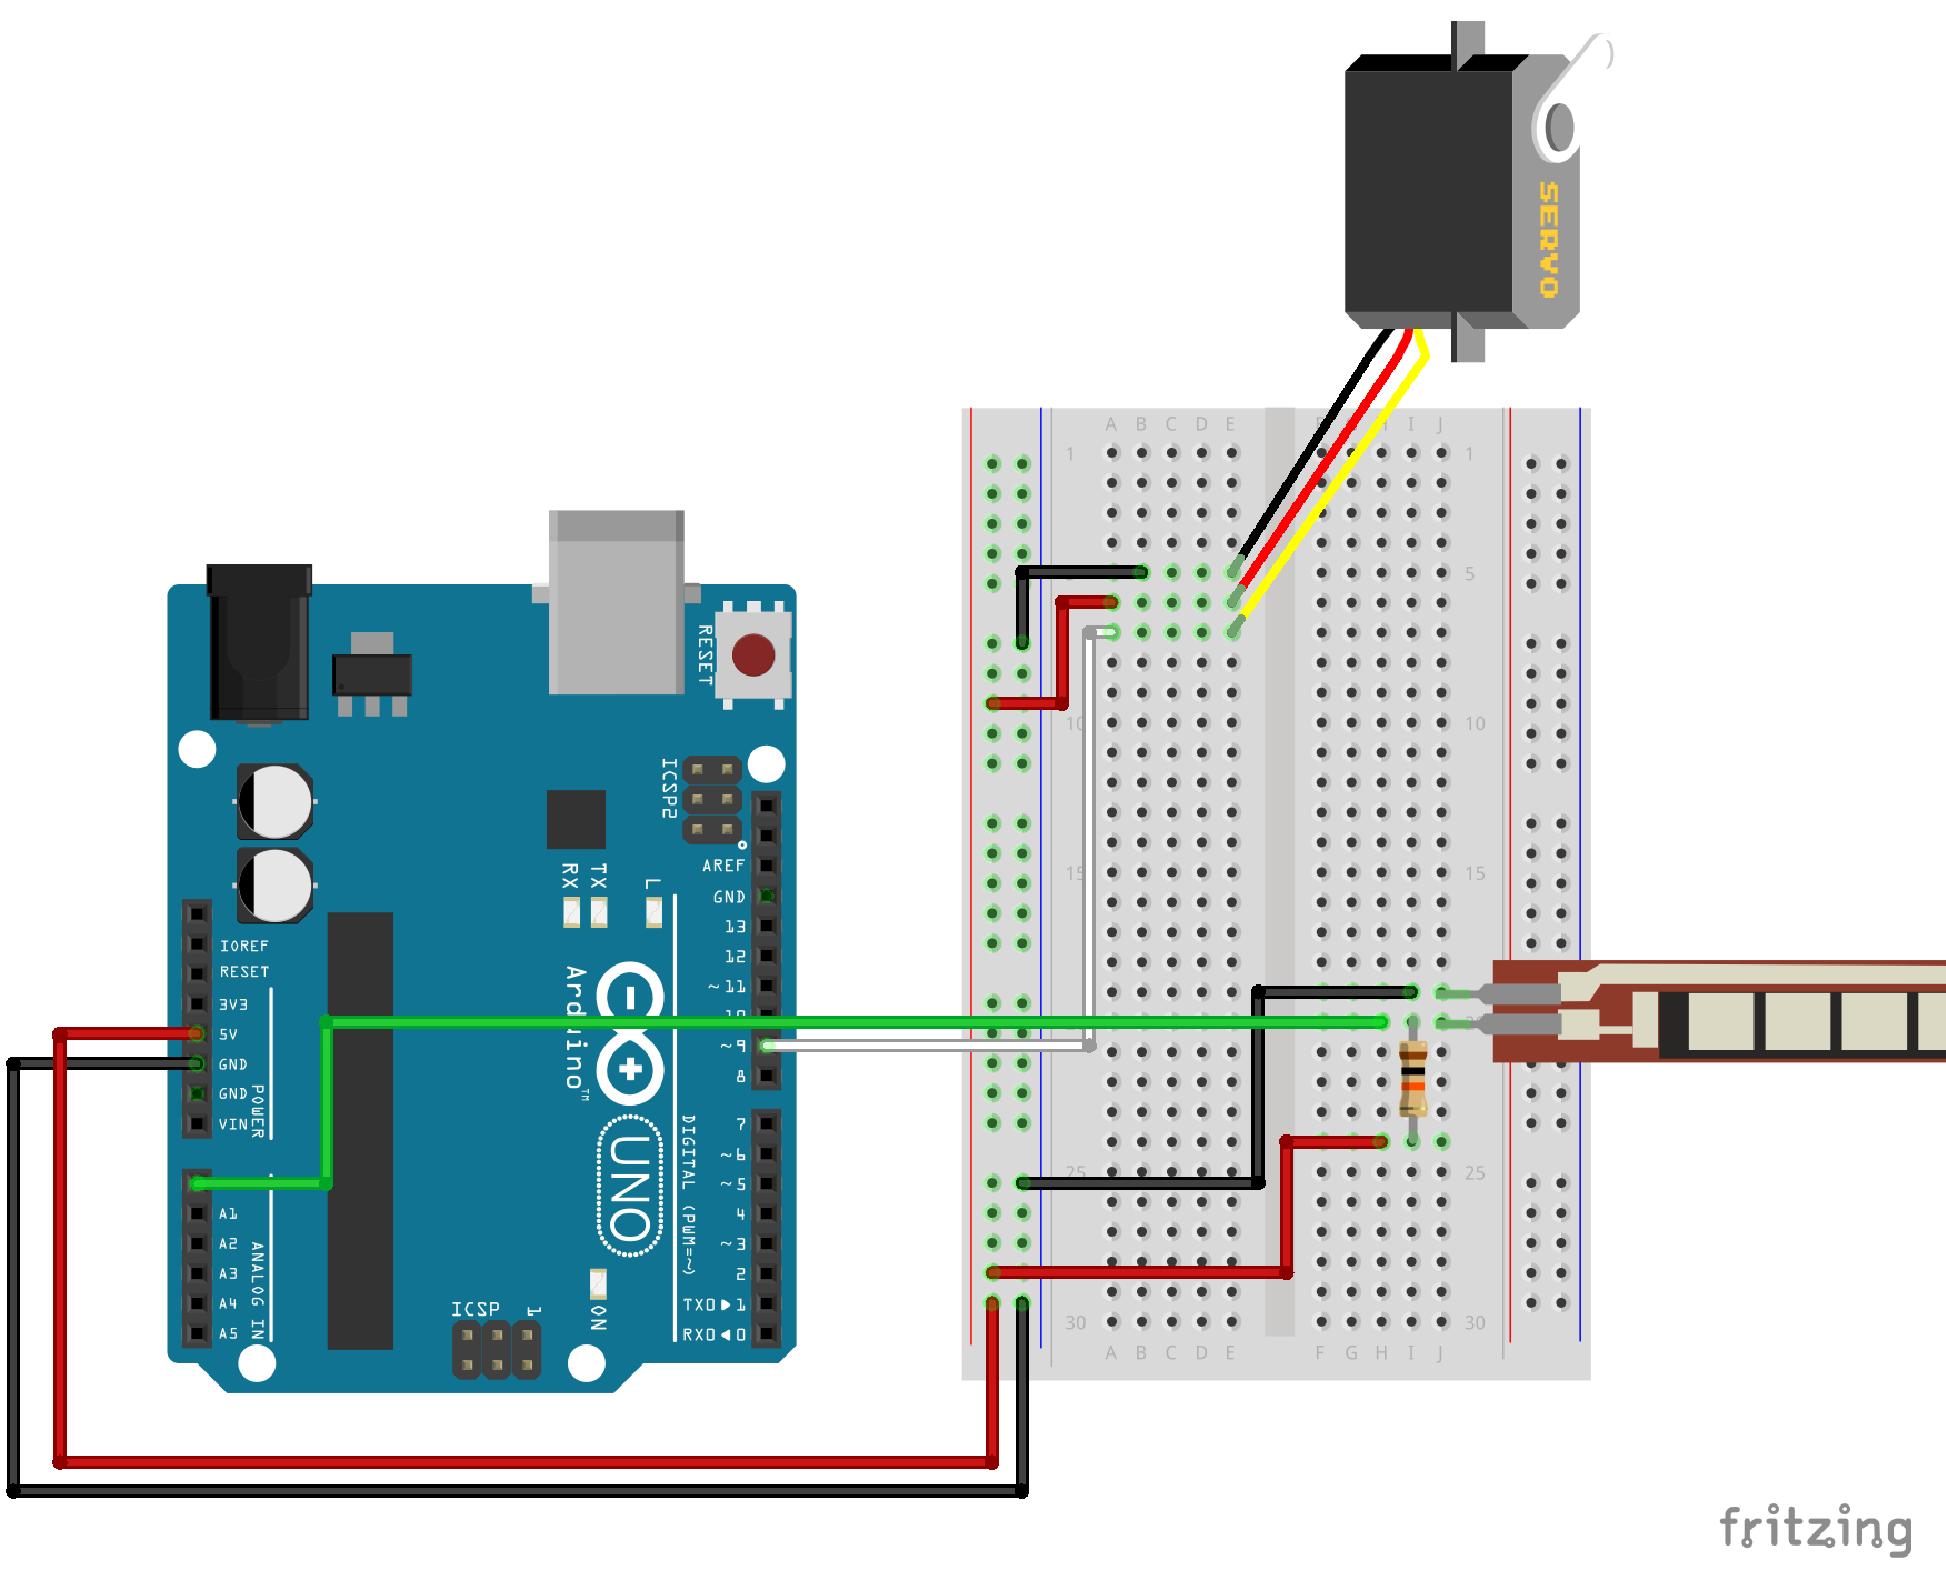 Arduino circuit 09 02 01 pwnvnq9pqn